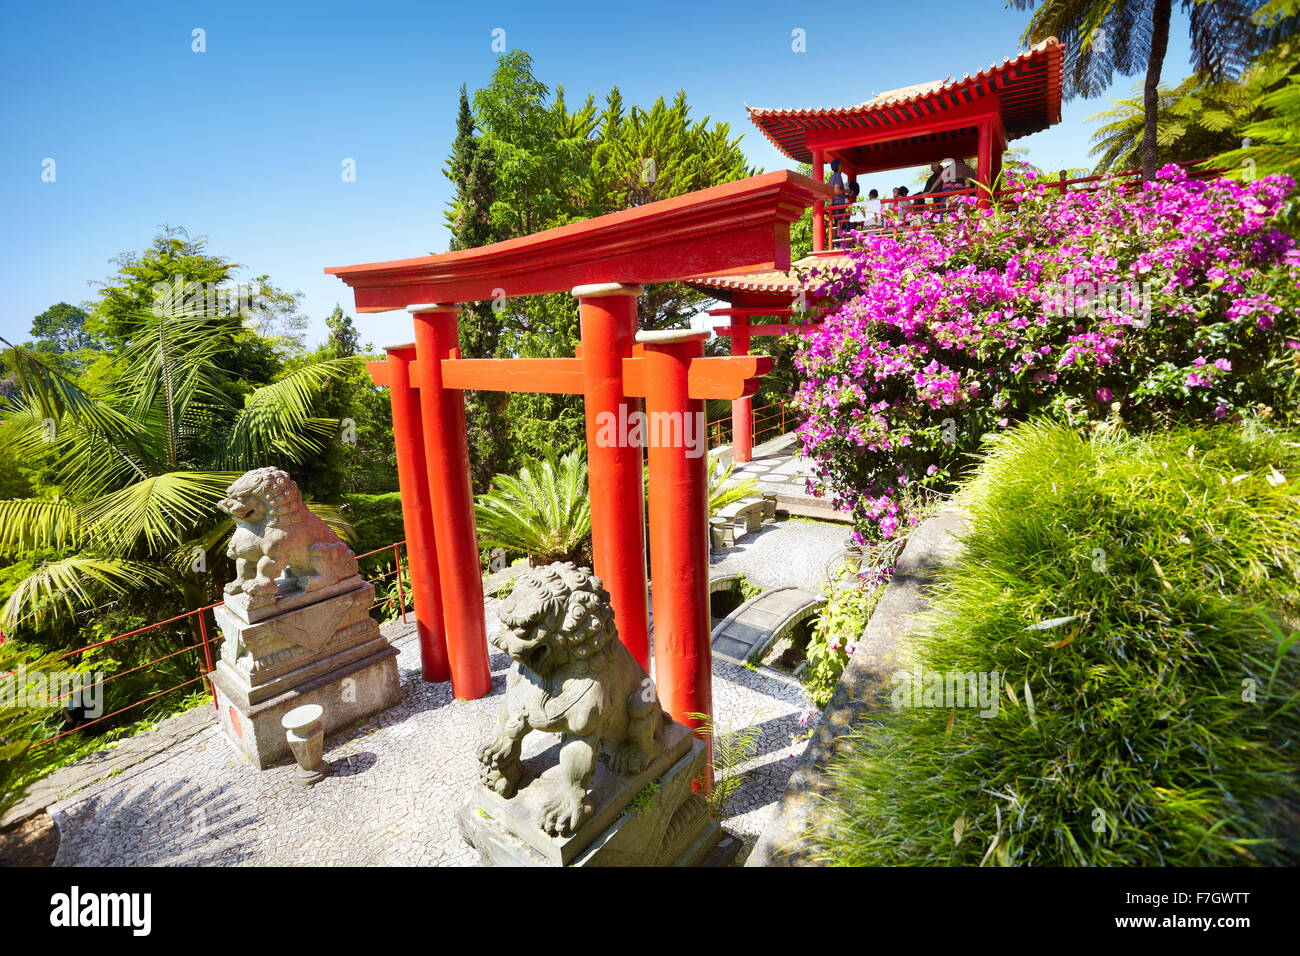 Japón japonés jardín tropical oriental - Monte, la isla de Madeira, Portugal Imagen De Stock